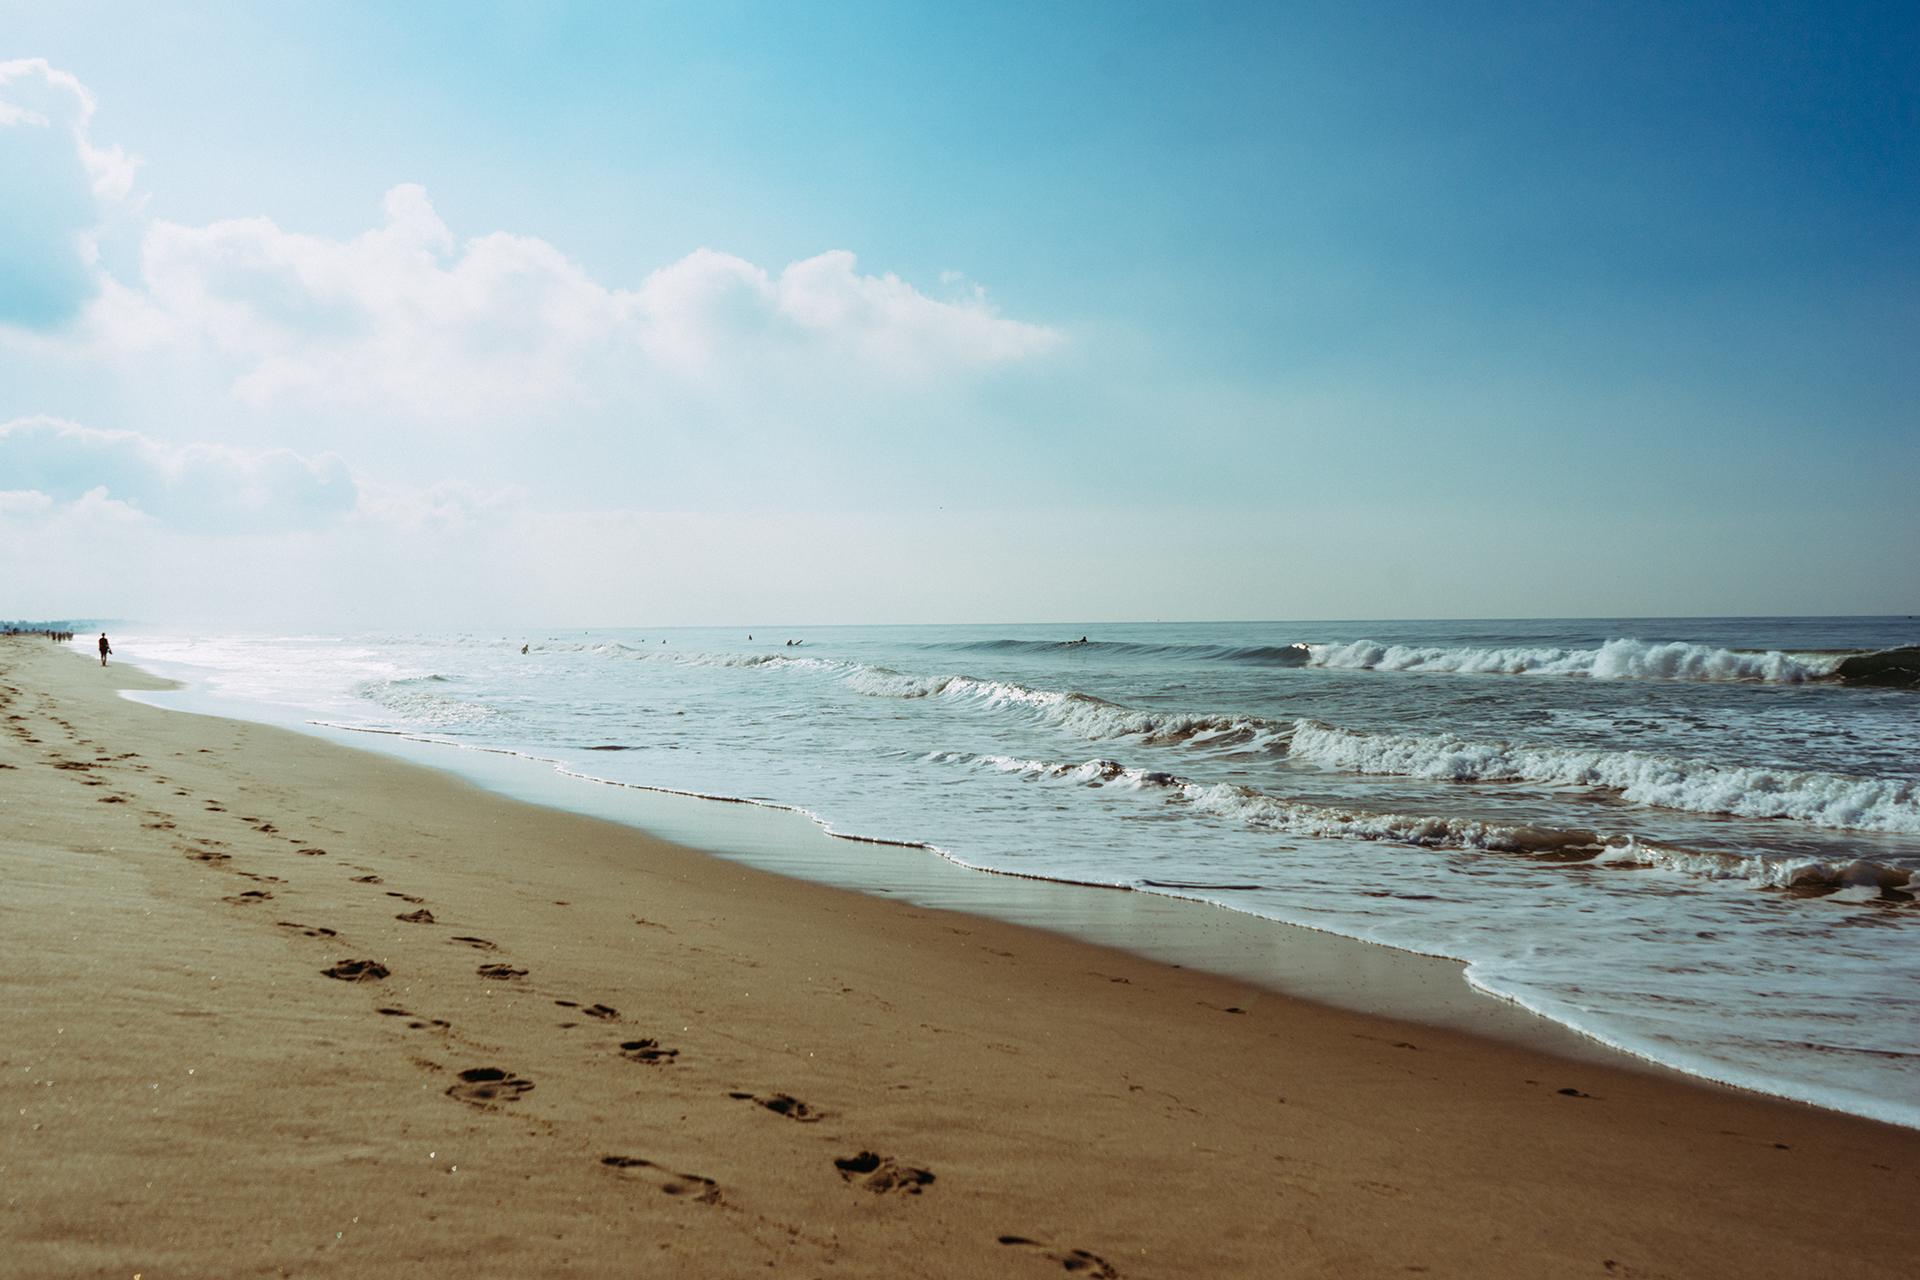 Beach Sea Coast Sand Ocean Horizon Cloud S Wave Footprint Steps Bay Body Of Water Salt